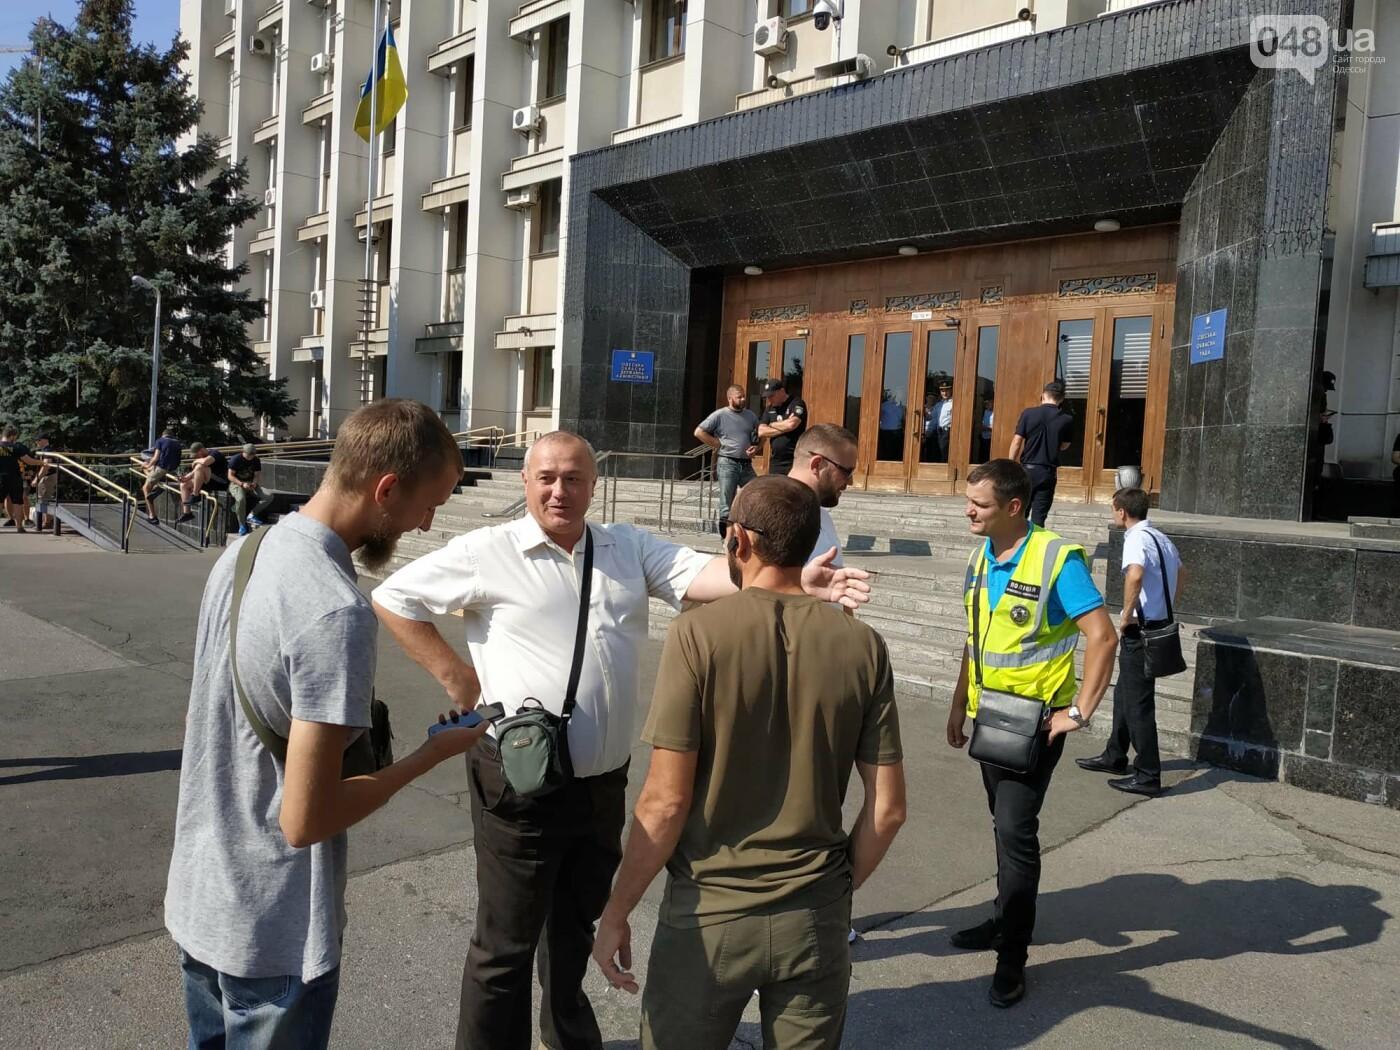 Стало известно, кто возглавил Одесский областной совет, - ФОТО, фото-3, Фото: Александр Жирносенко